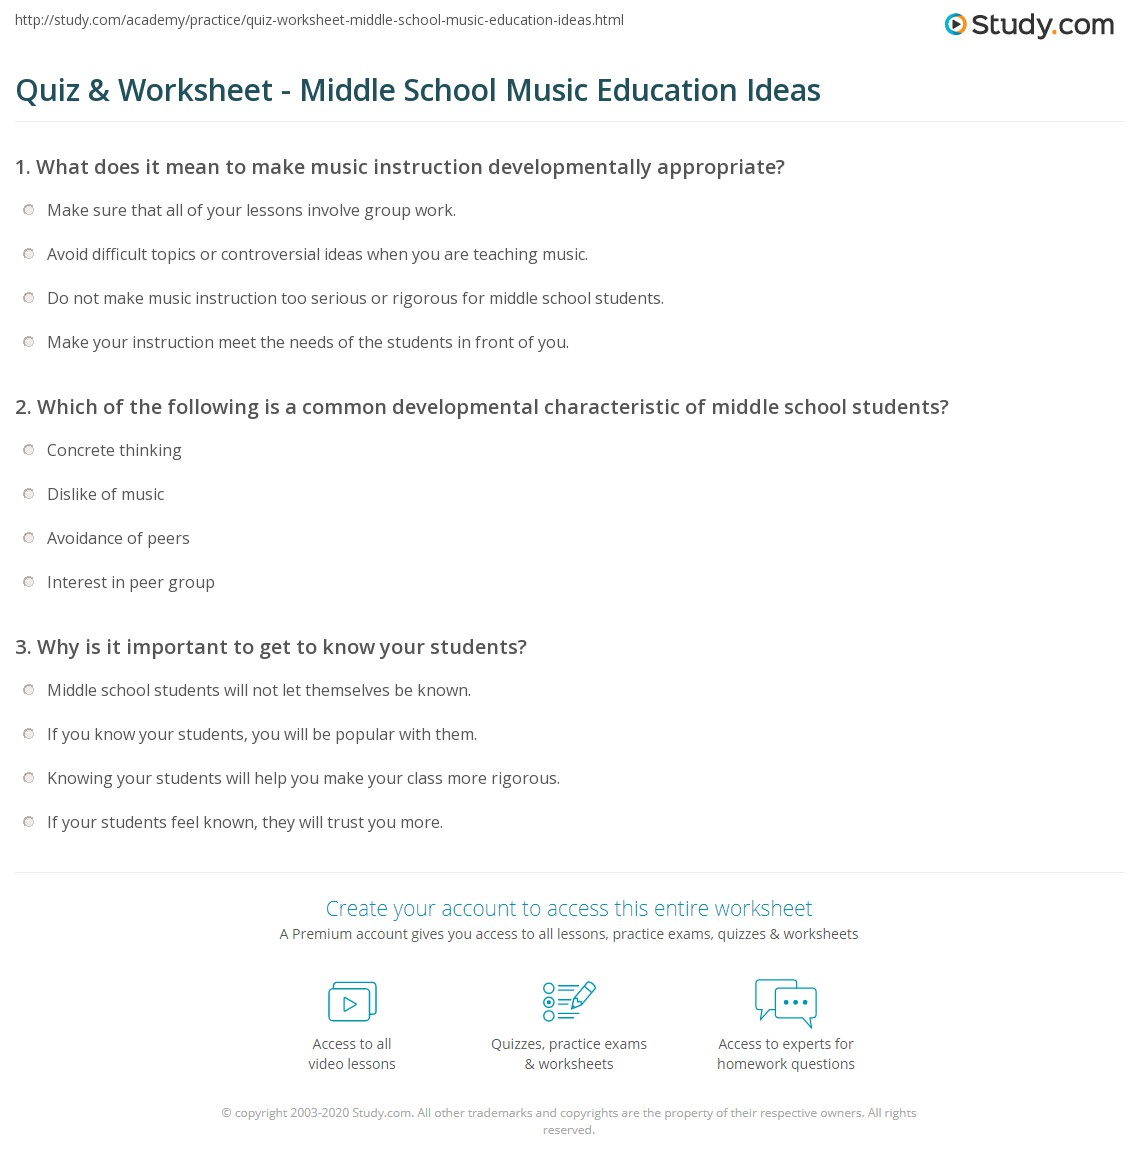 Quiz & Worksheet - Middle School Music Education Ideas  Study.com Inside Following Directions Worksheet Middle School